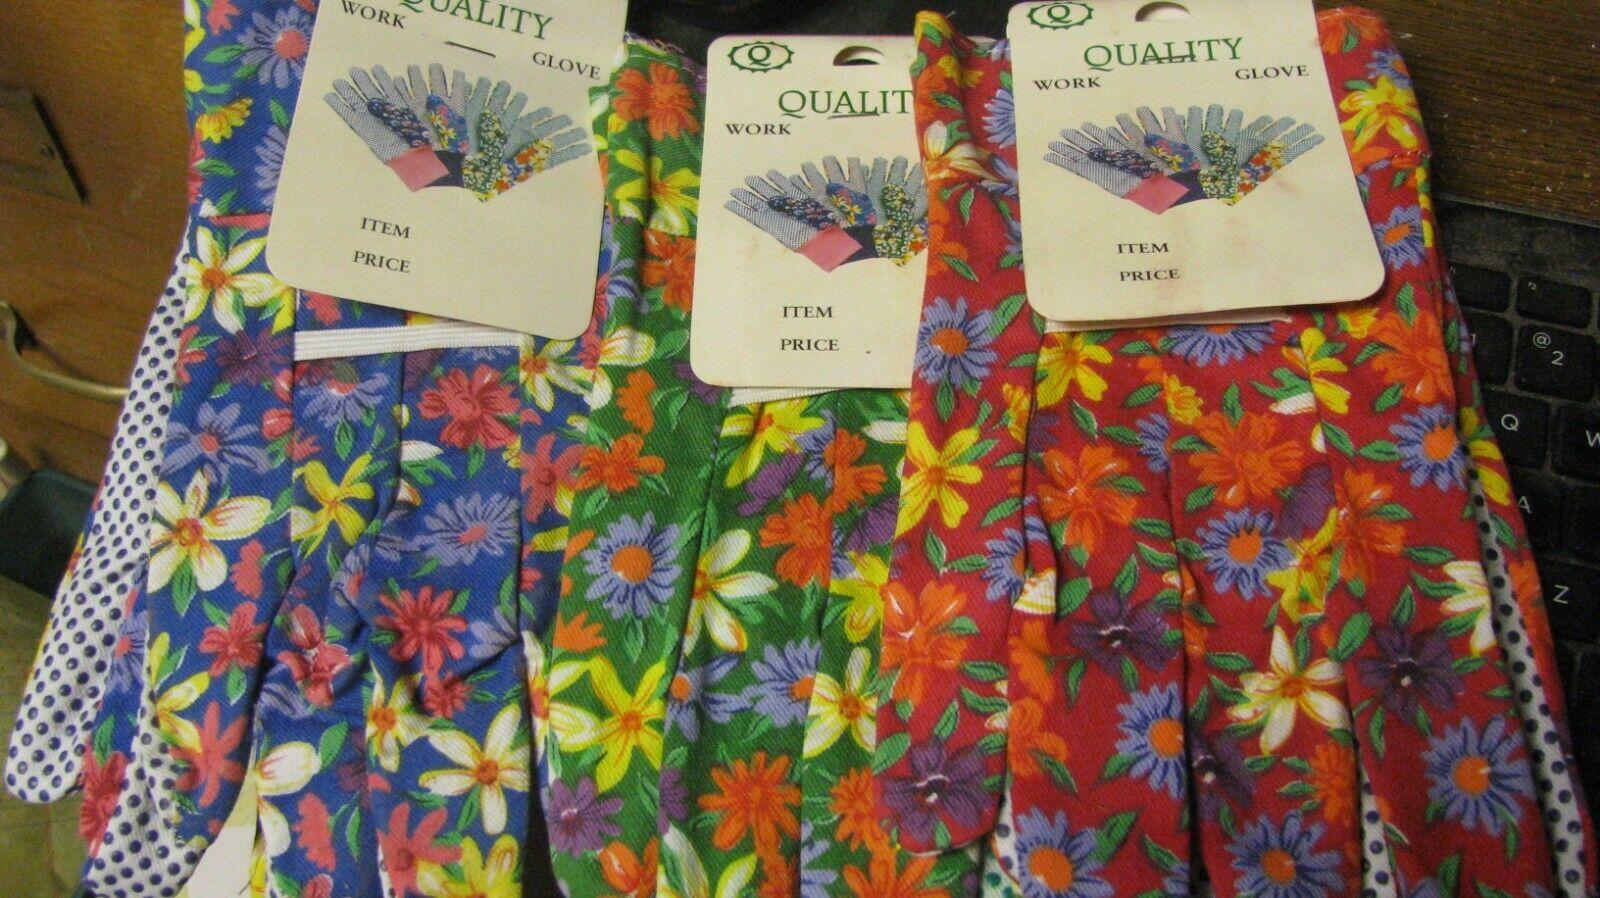 womens garden gloves, 3 pair, new, free shipping 2